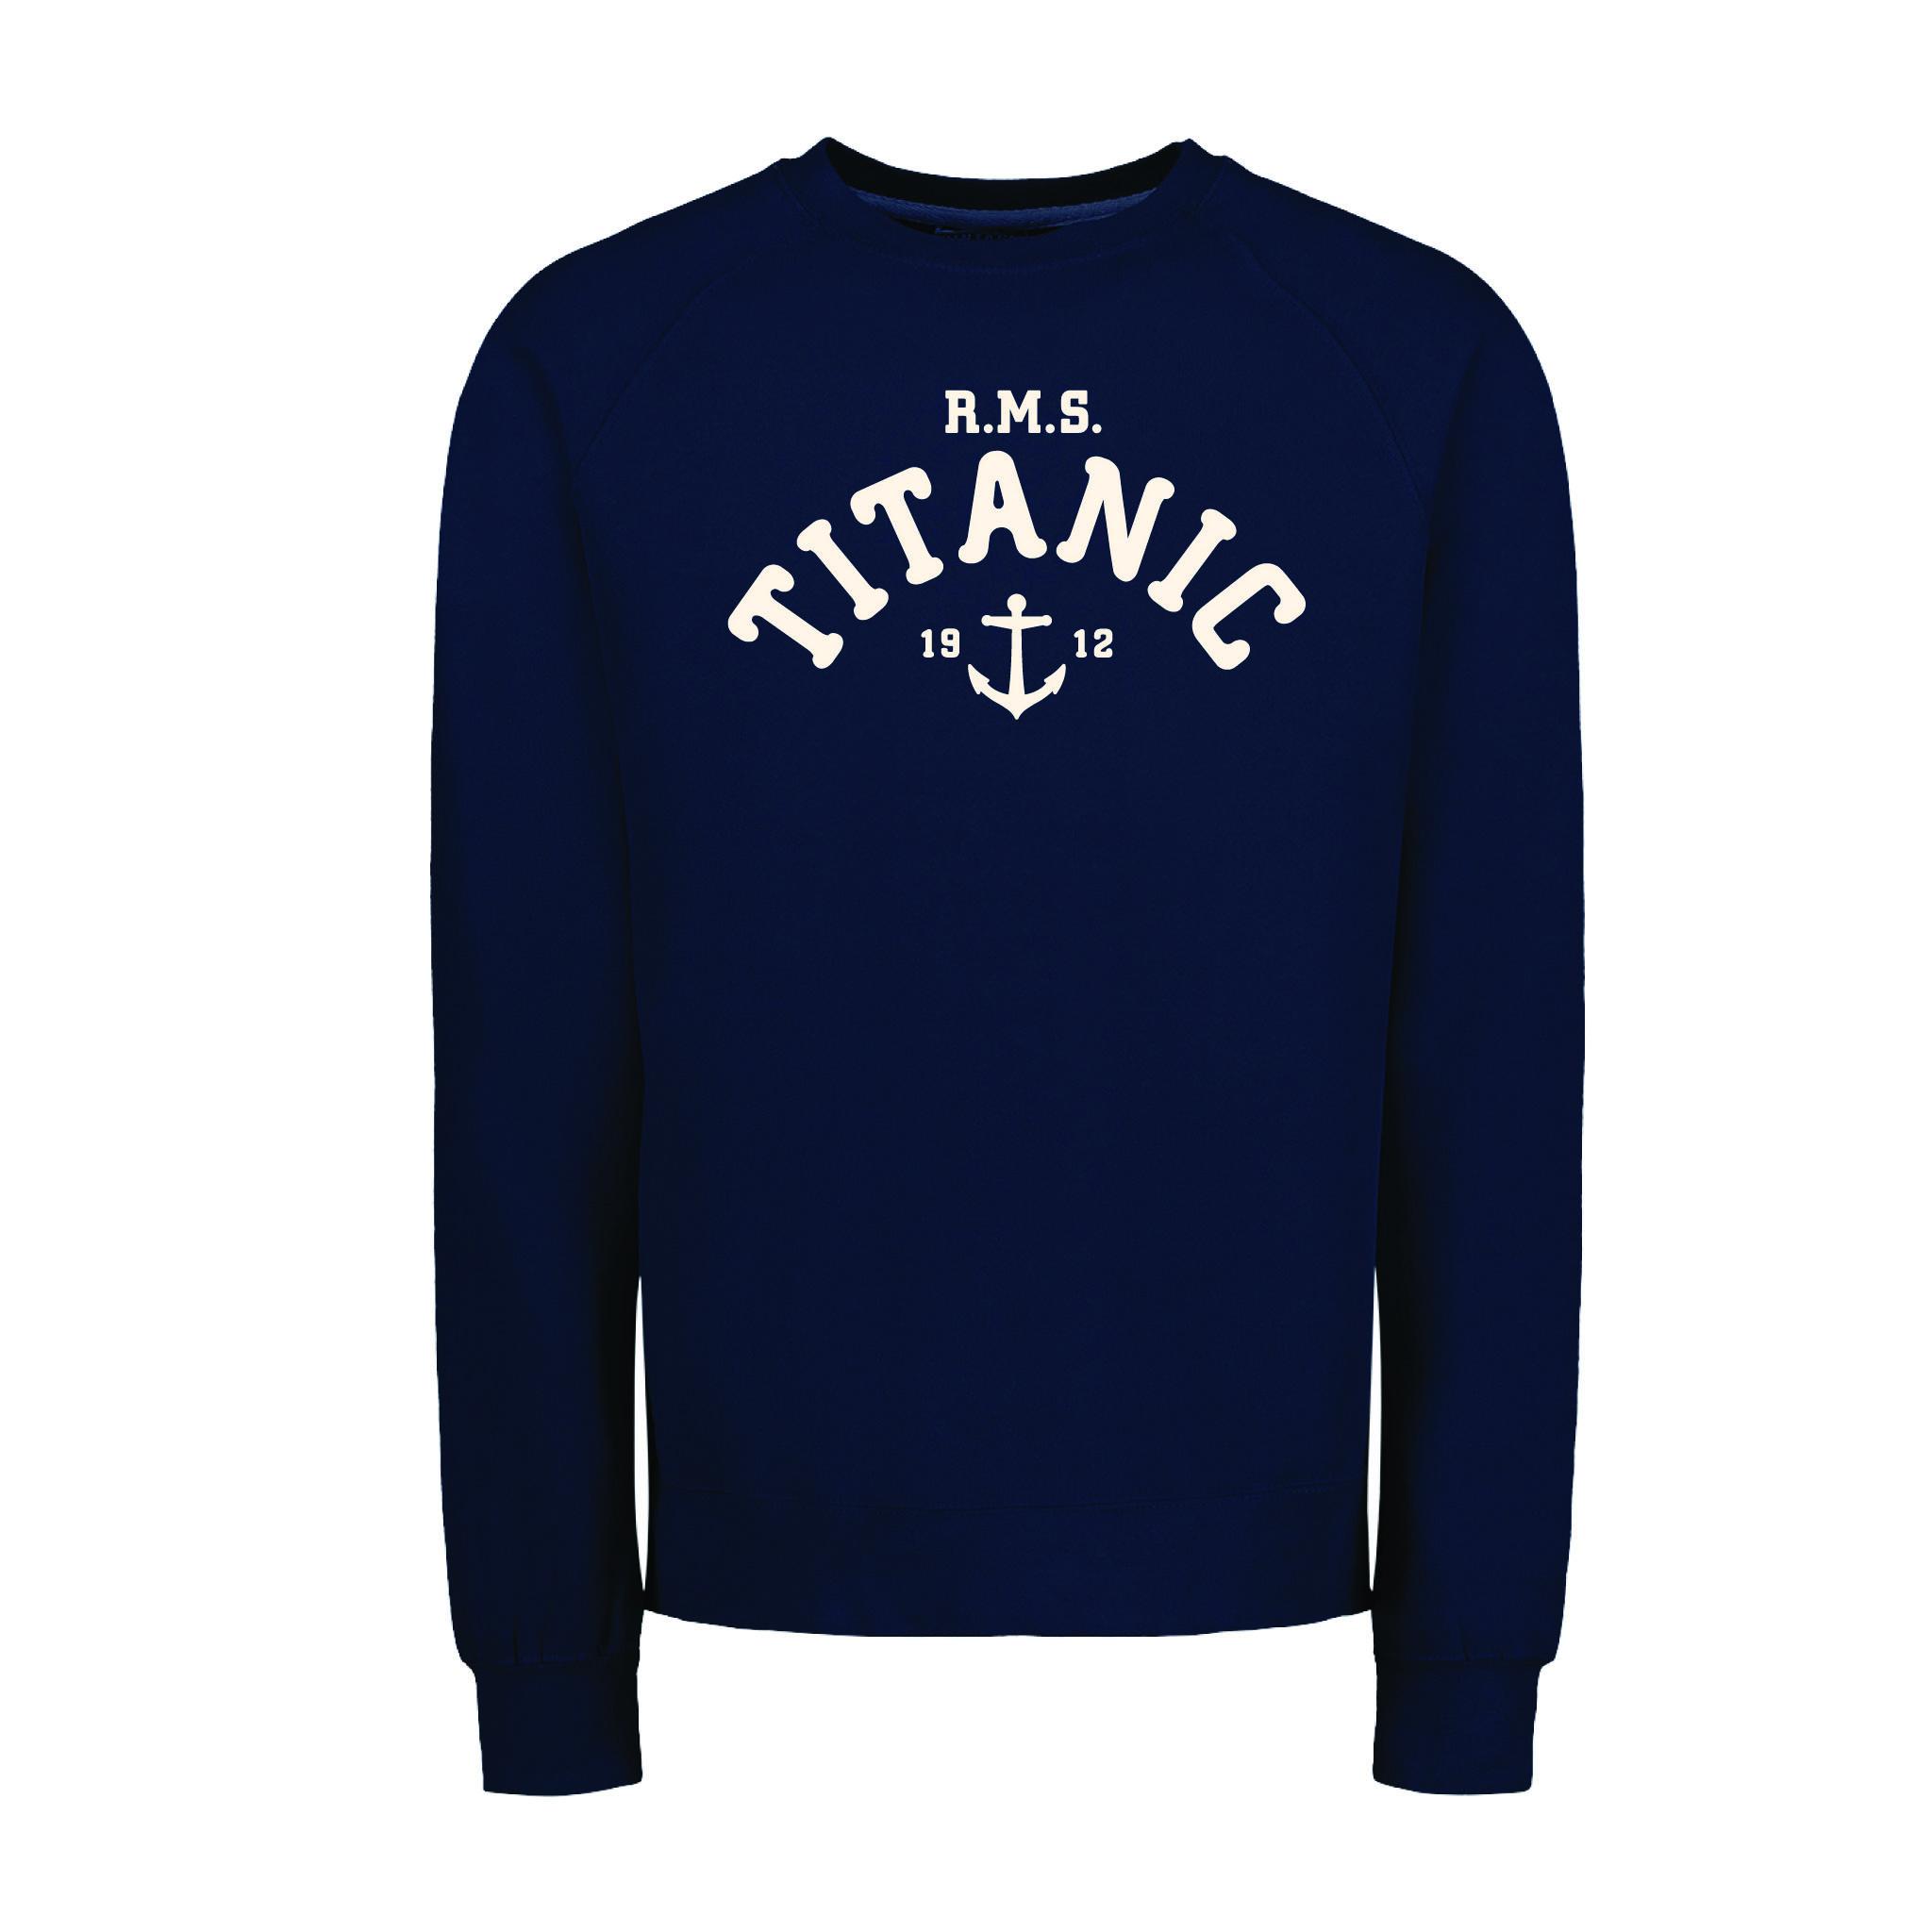 Vintage Fleece Titanic Full Chest Applique